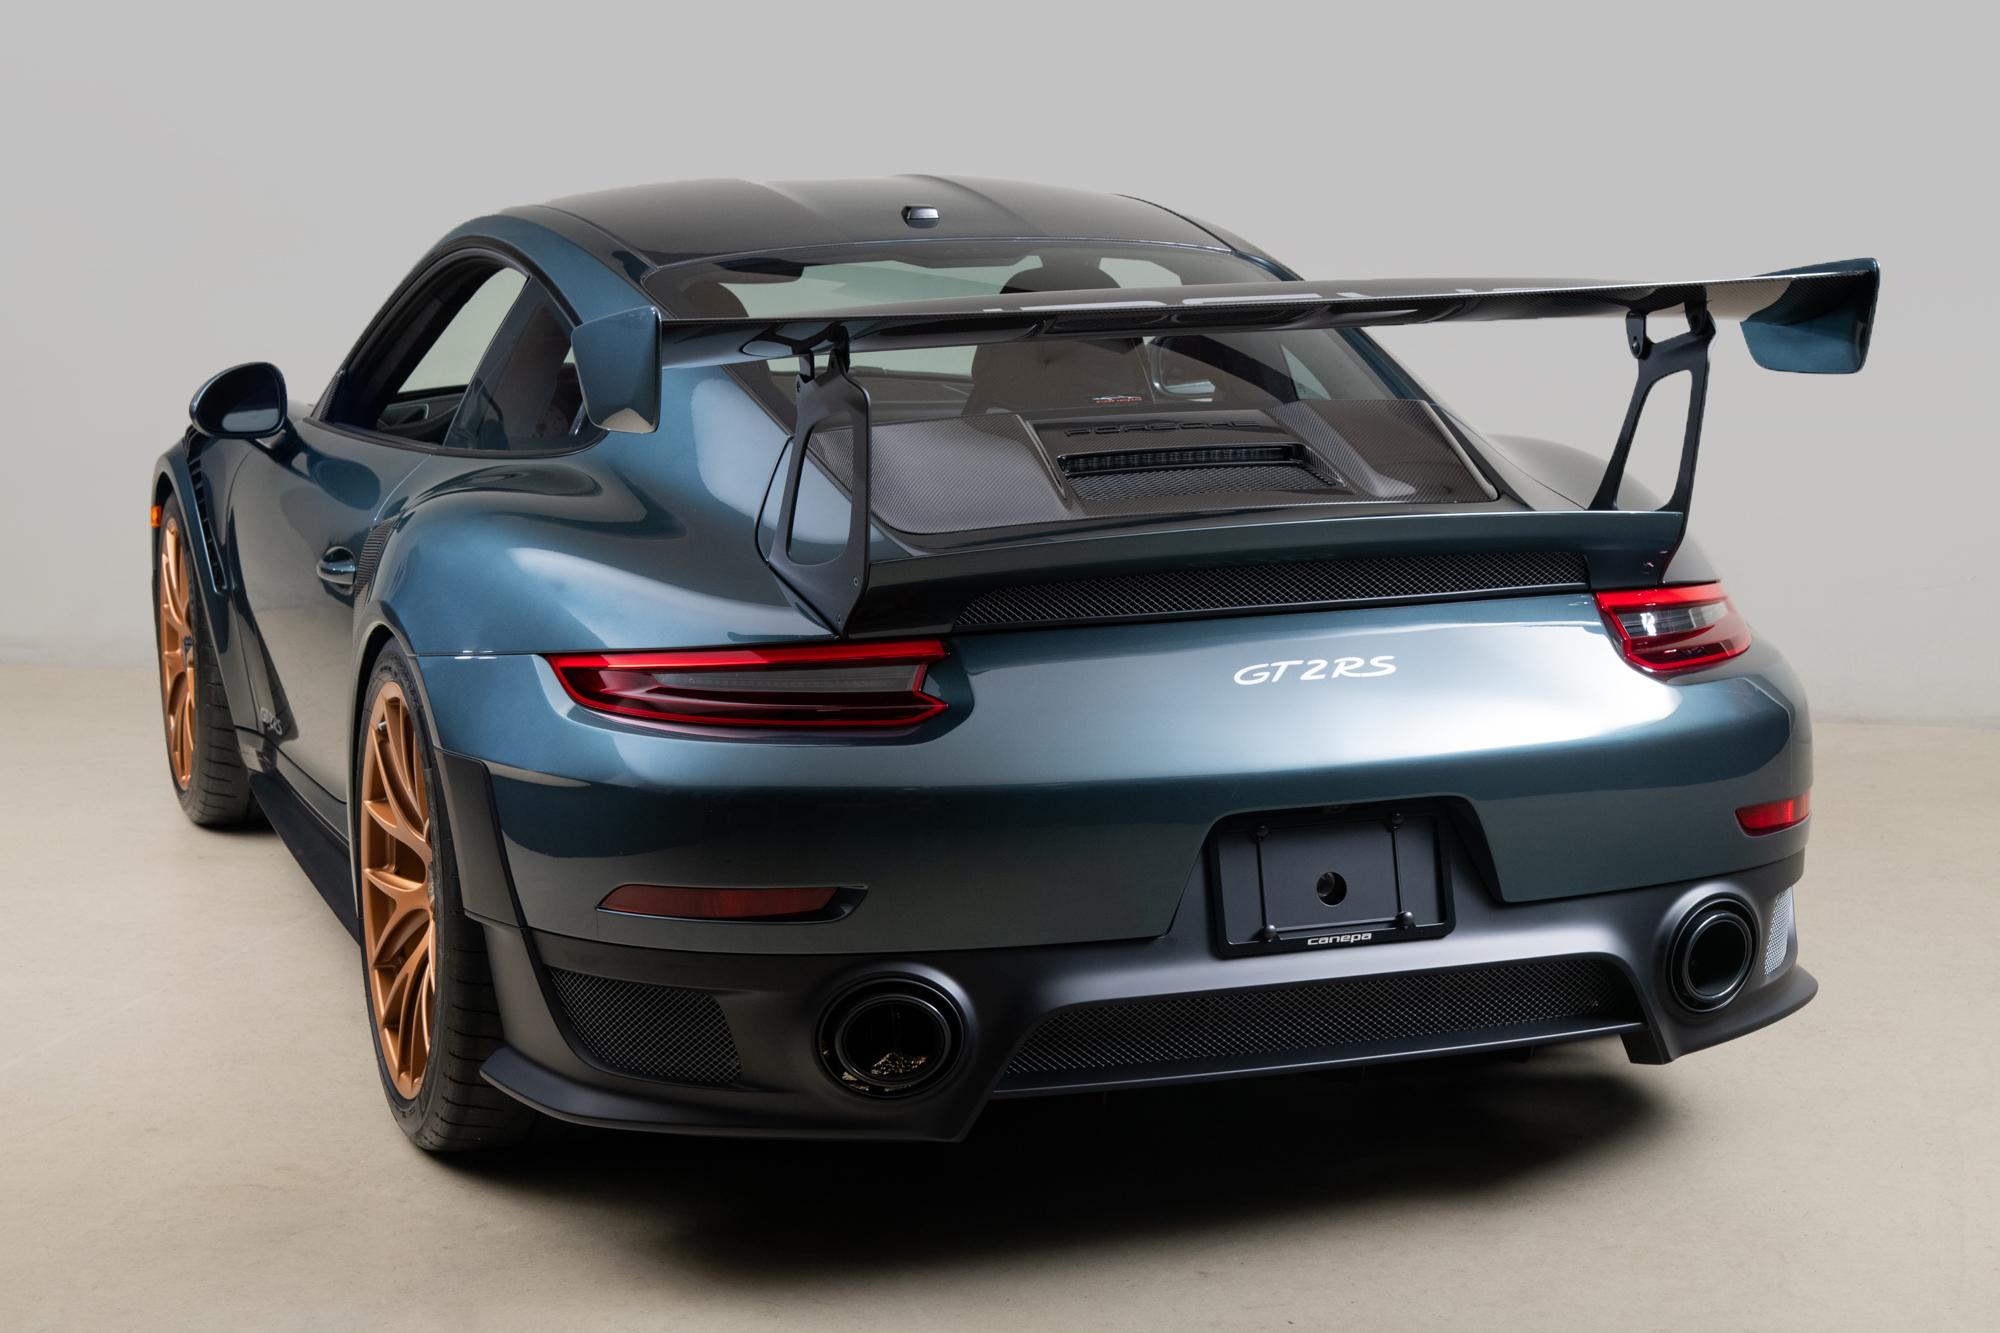 2019 Porsche GT2RS , AVENTURA GREEN, VIN WP0AE2A9XKS155158, MILEAGE 637